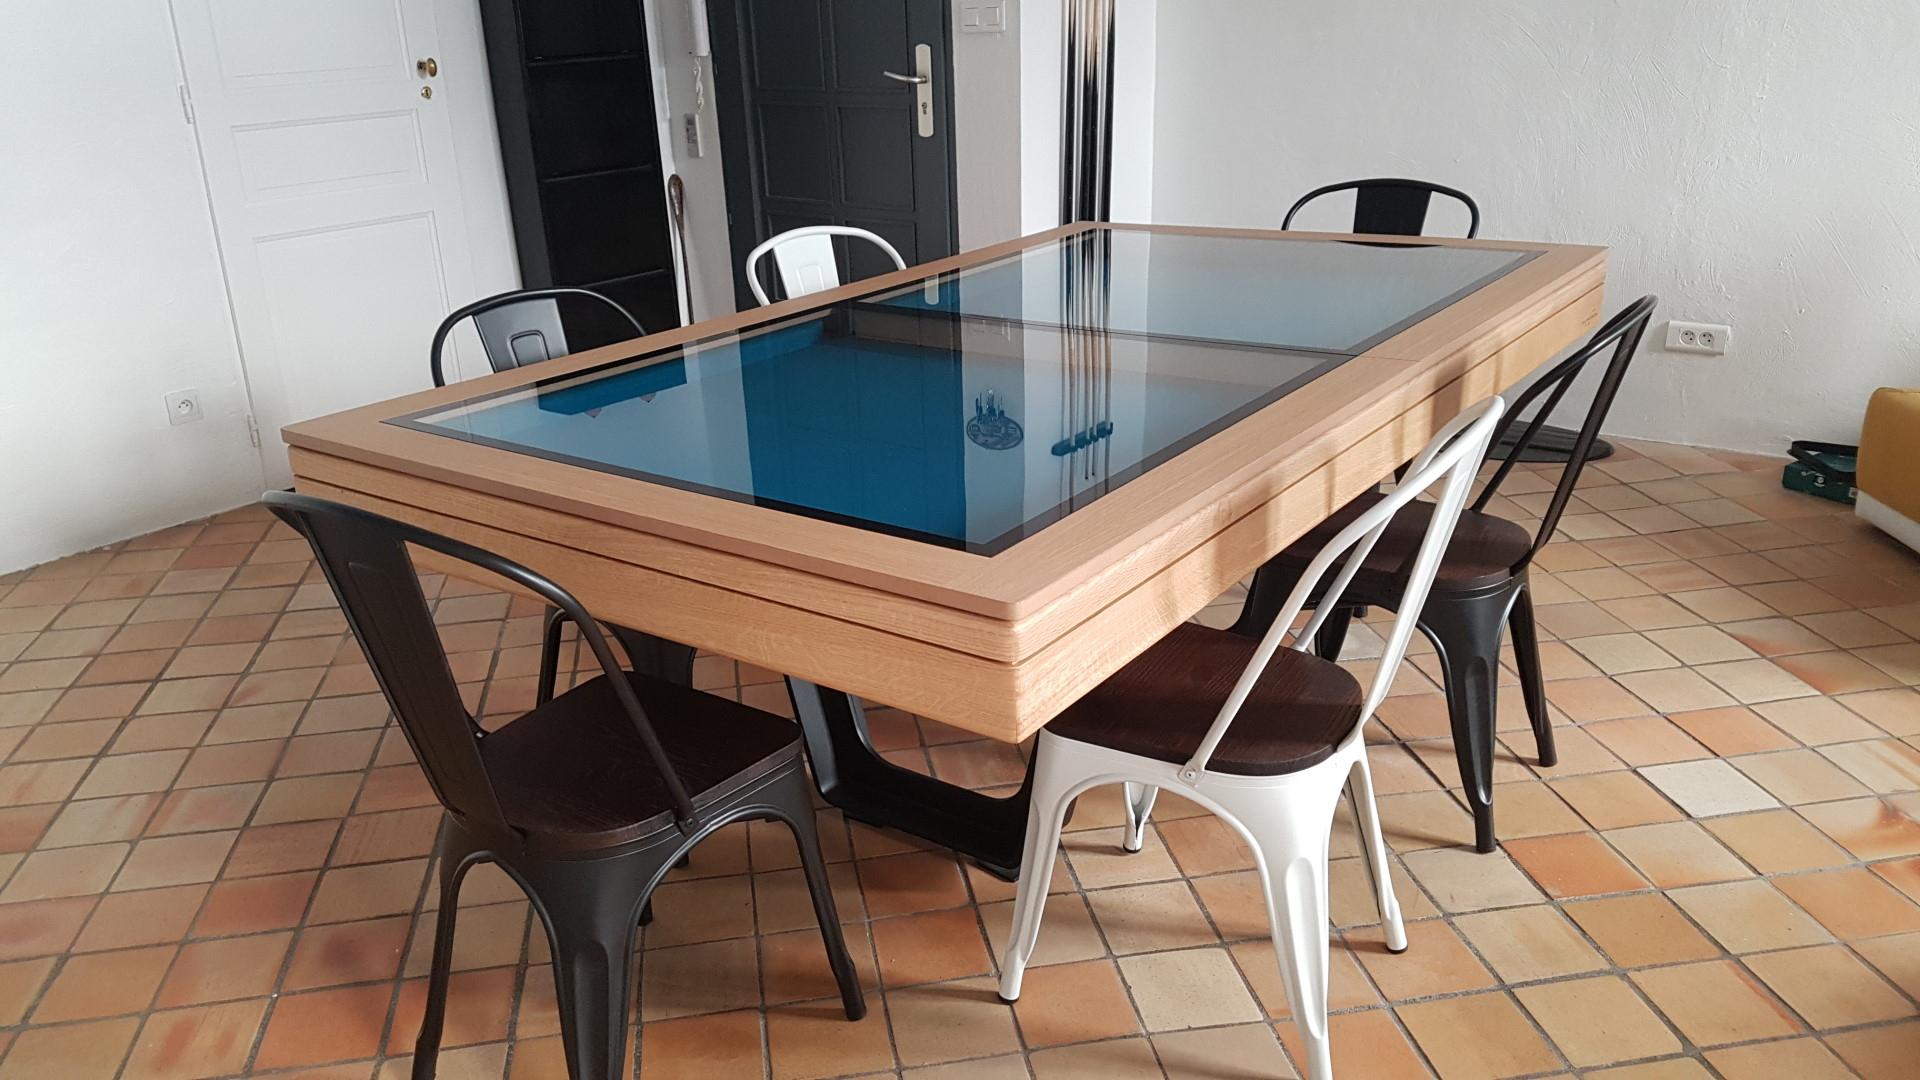 Table De Billard Convertible En Table À Manger | Billards Breton tout Billard Table À Manger Avec Rallonge